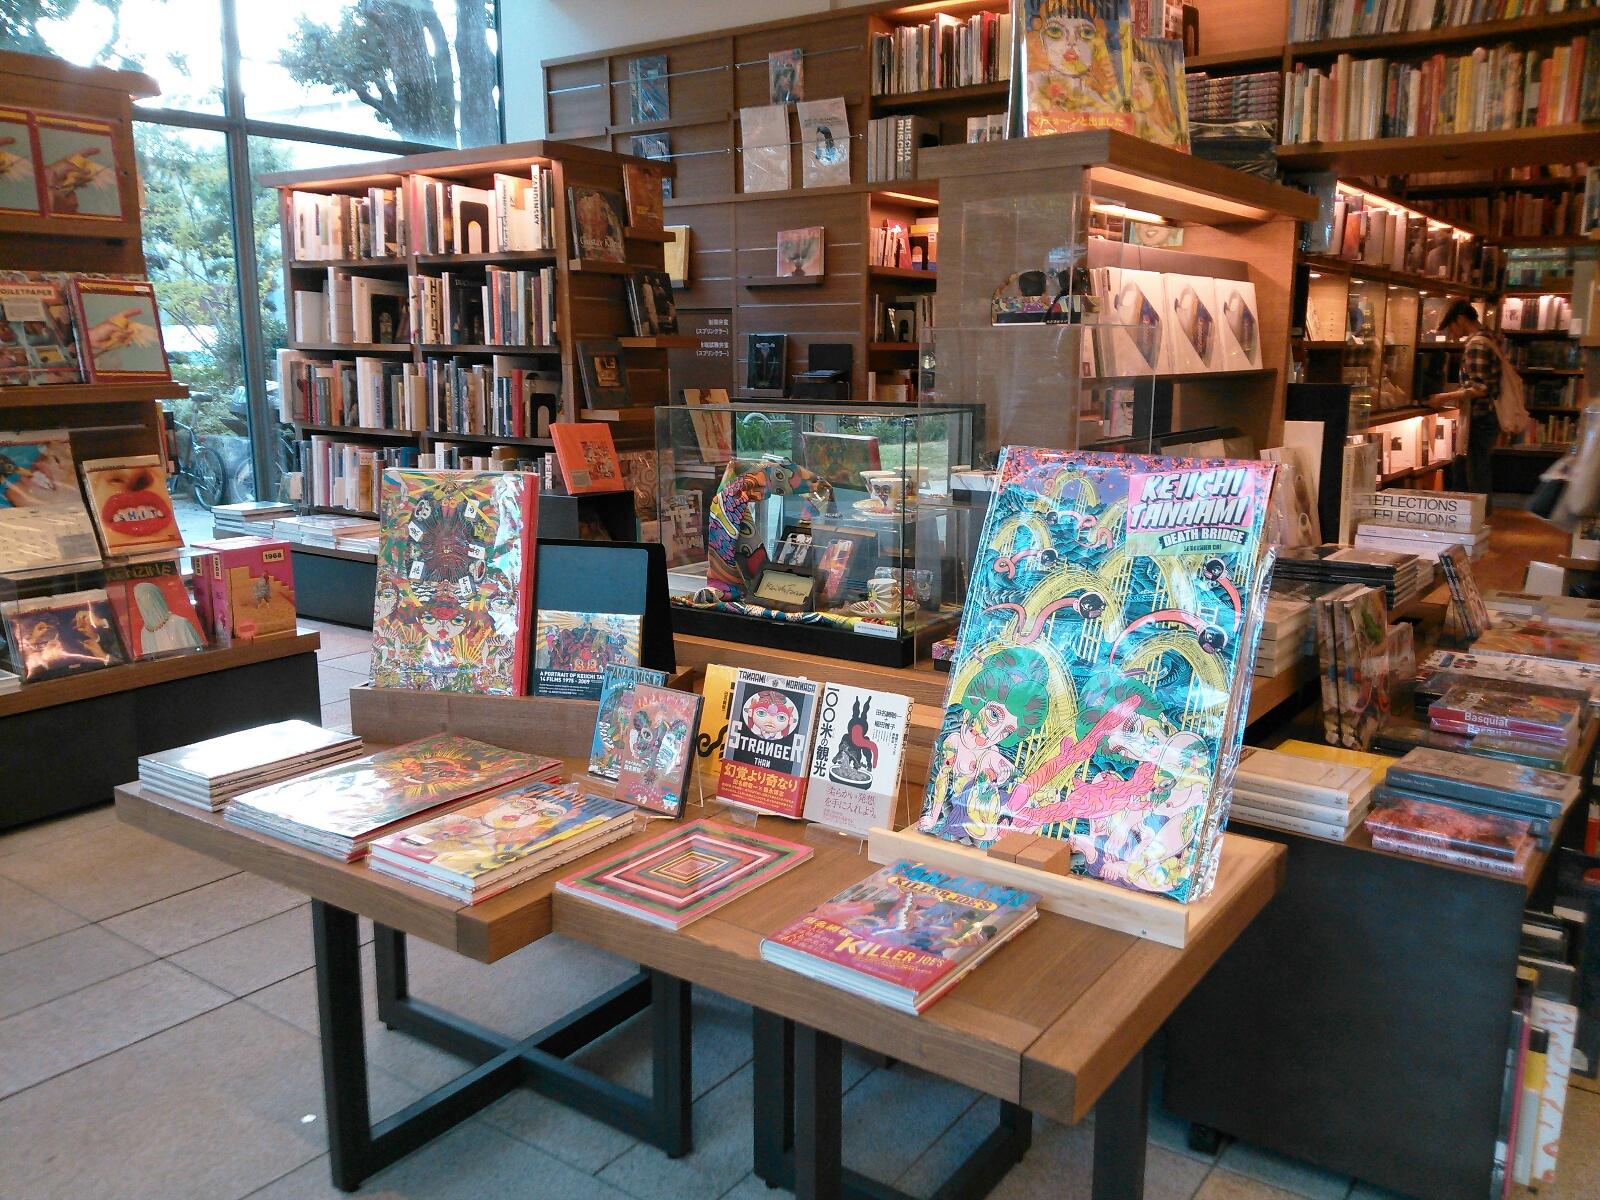 Tanaami Keiichi book by United Dead Artist - Daikanyama